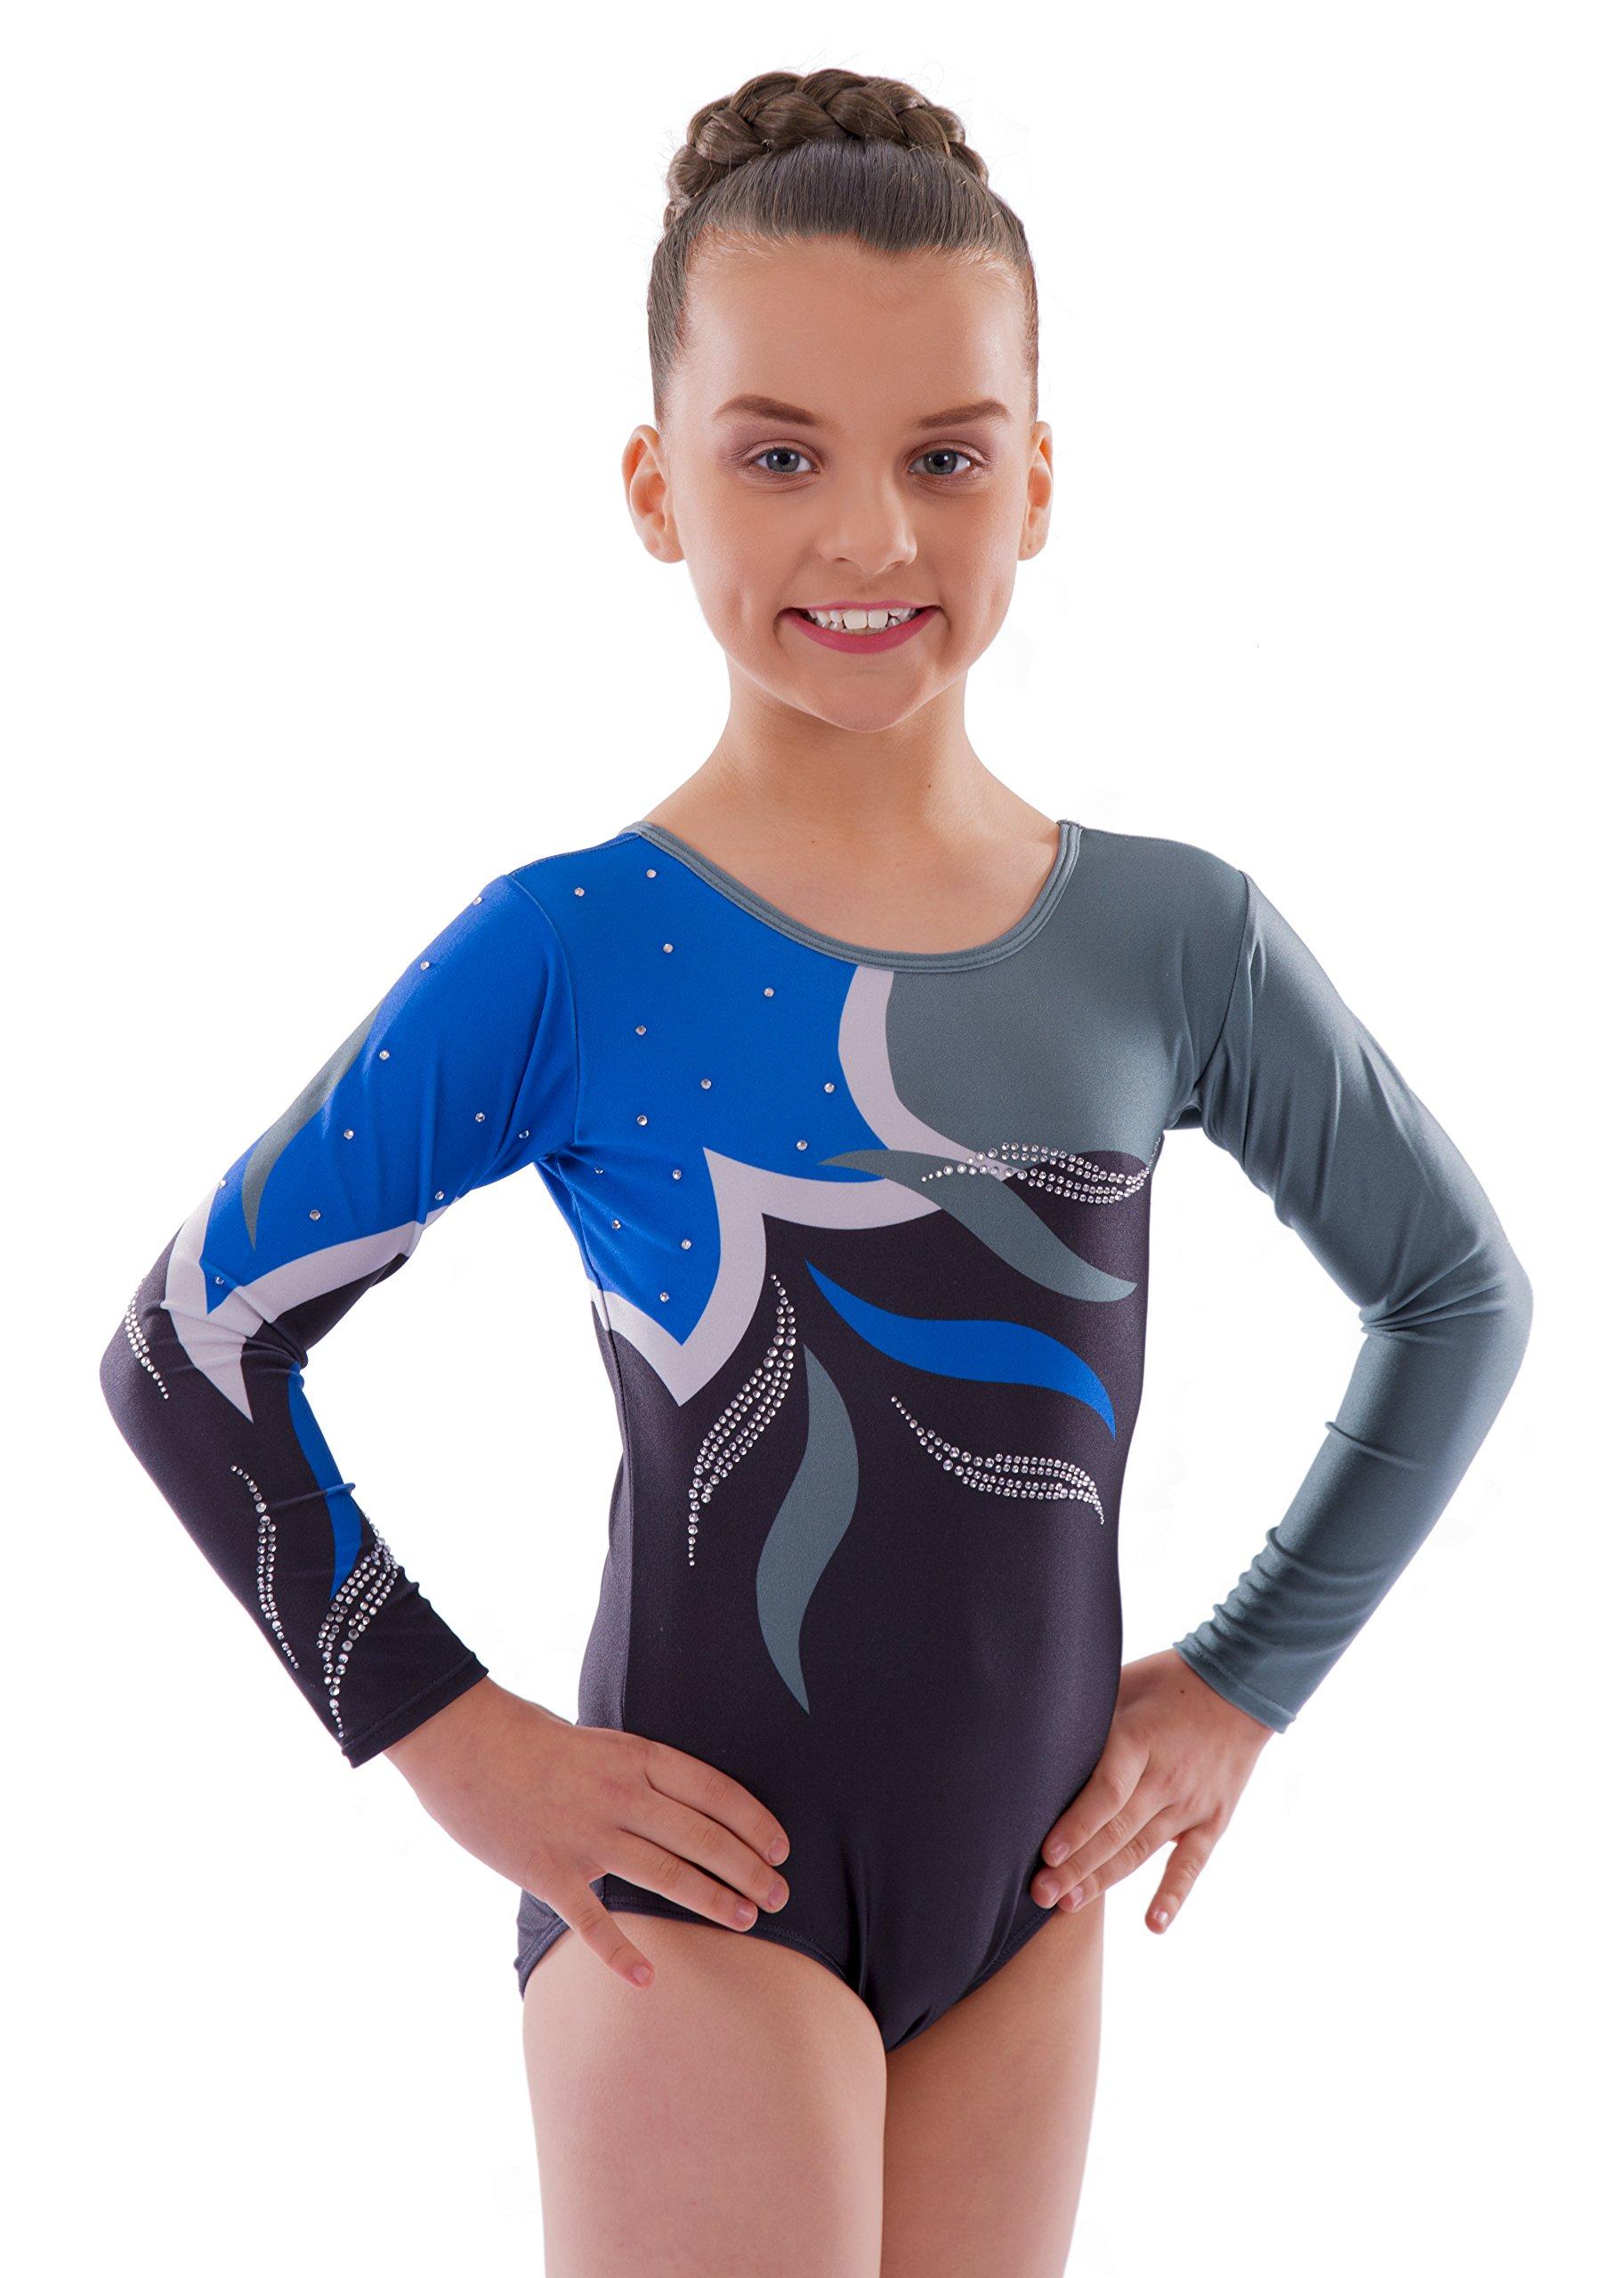 Ukyzddio Little Girls Long Sleeve Shiny Beads Gradient Athletic Dance Gymnastic Leotards